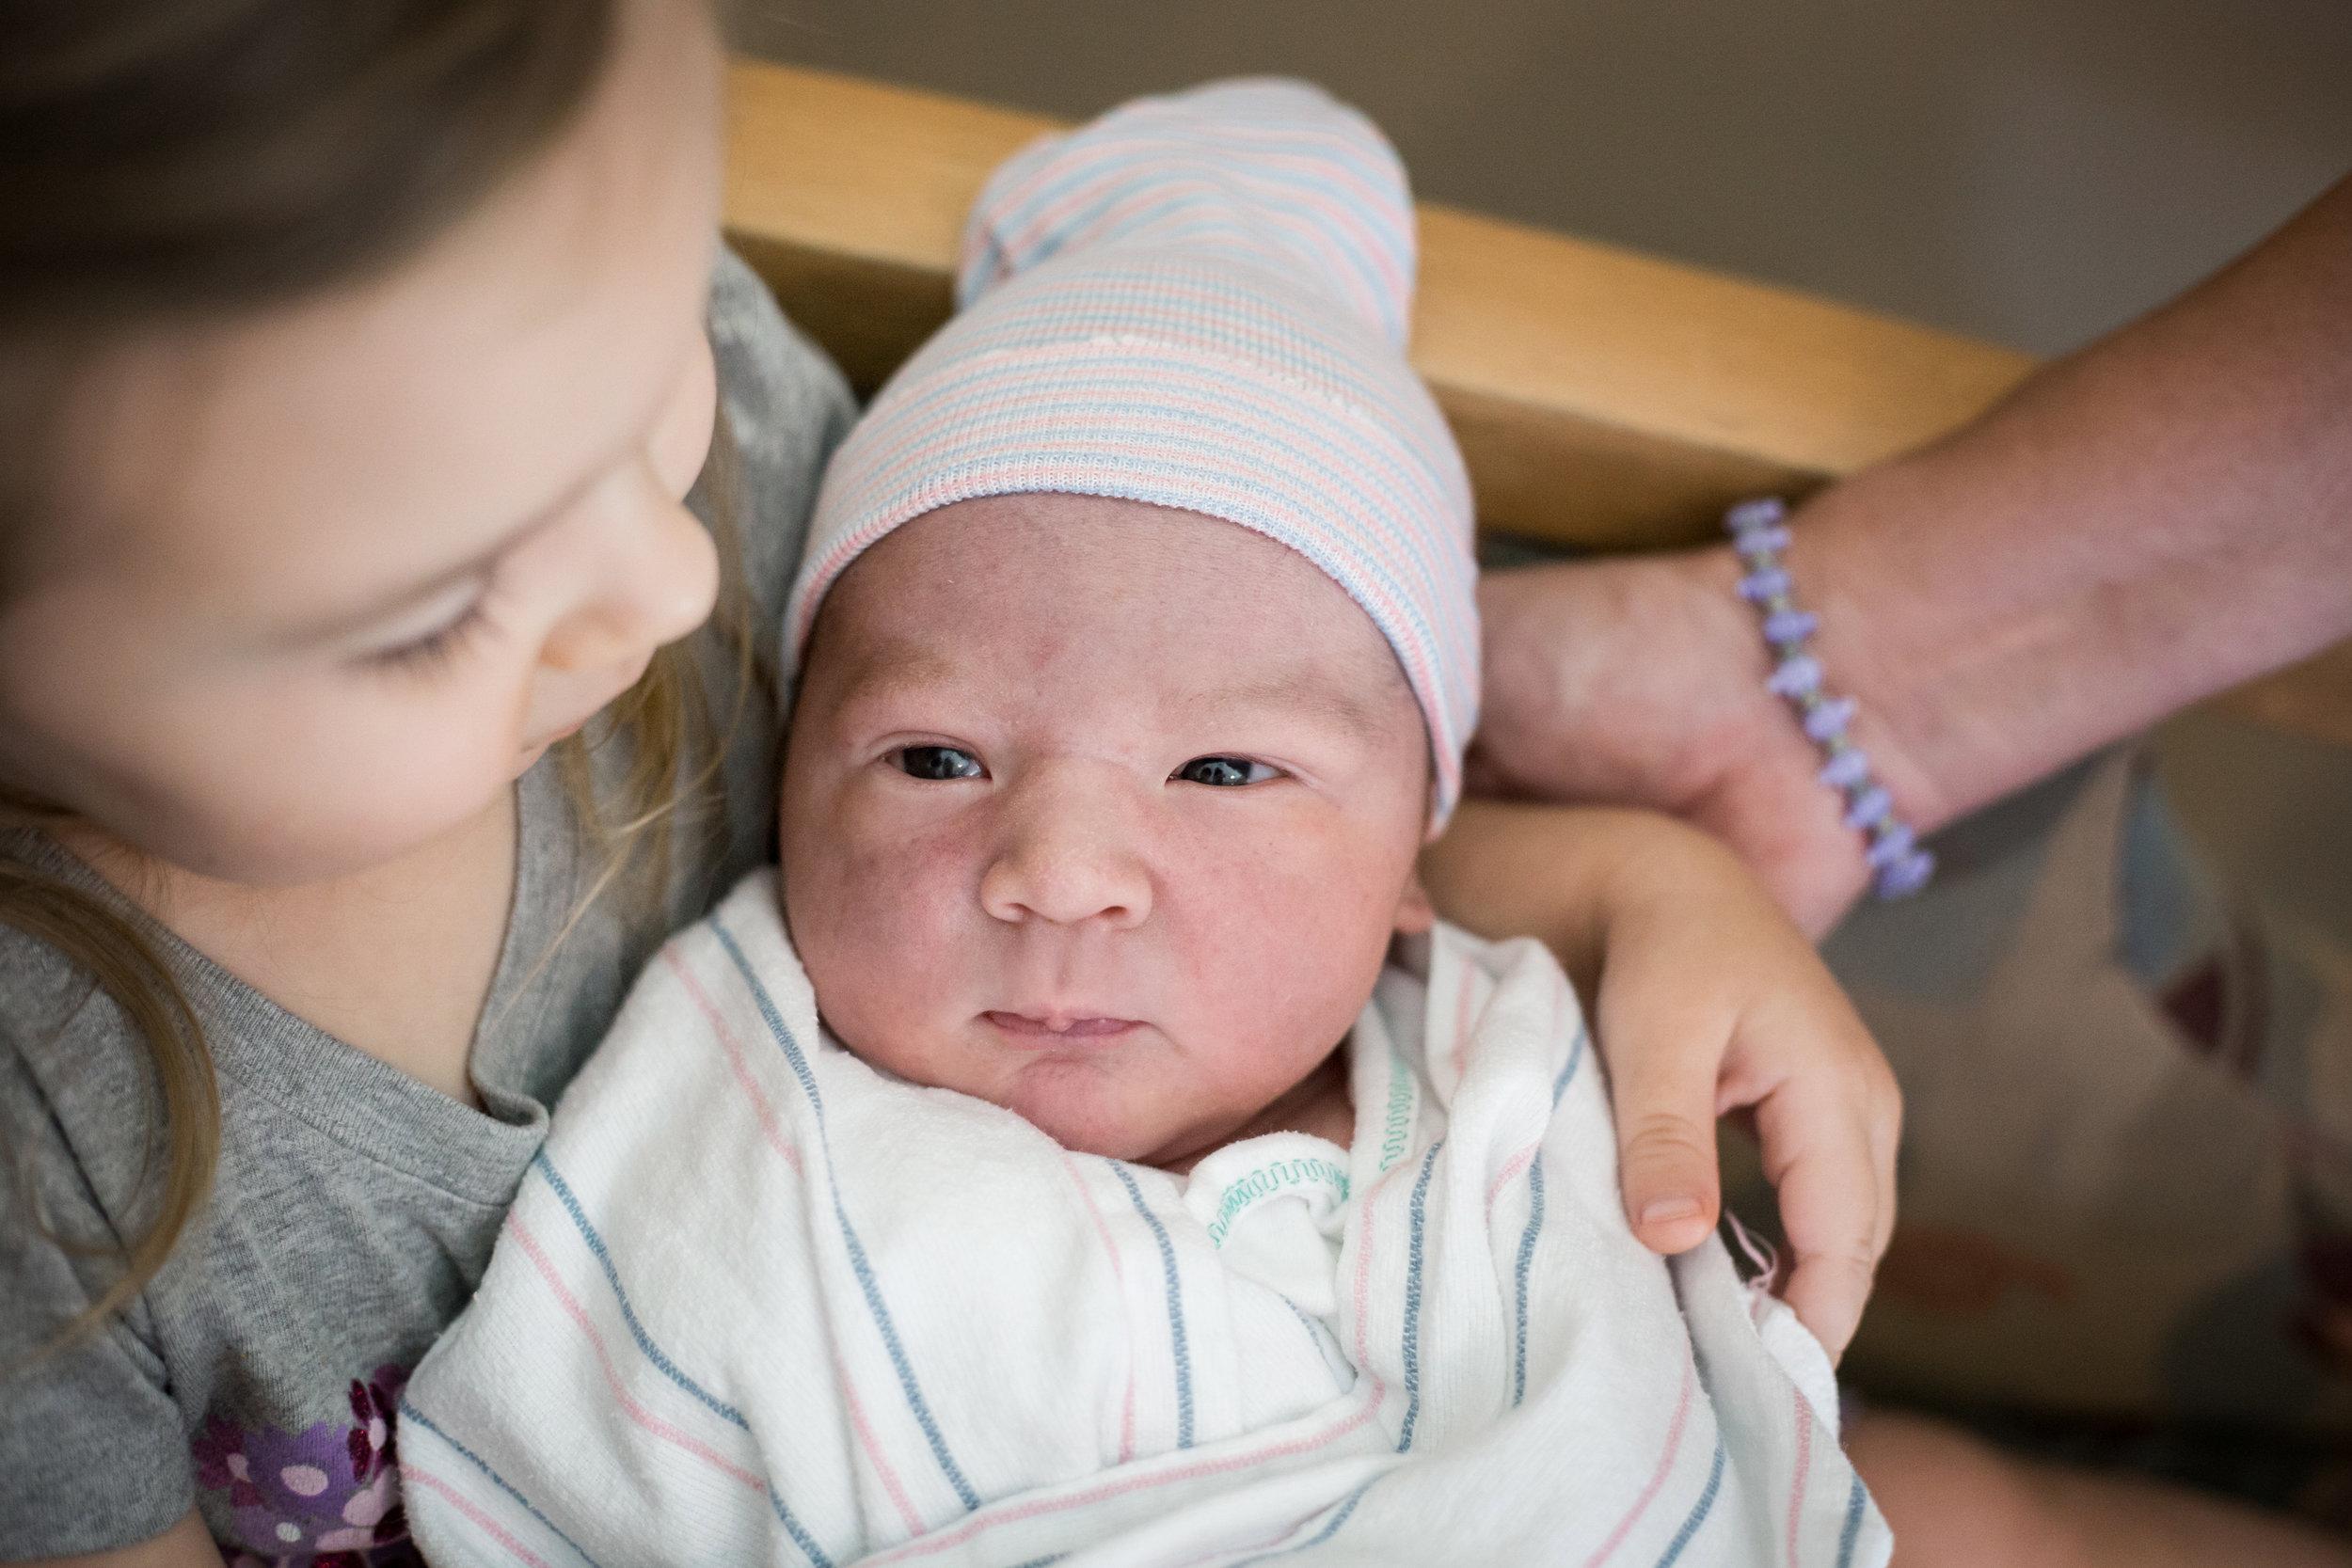 meeting-new-sibling-birth.jpg